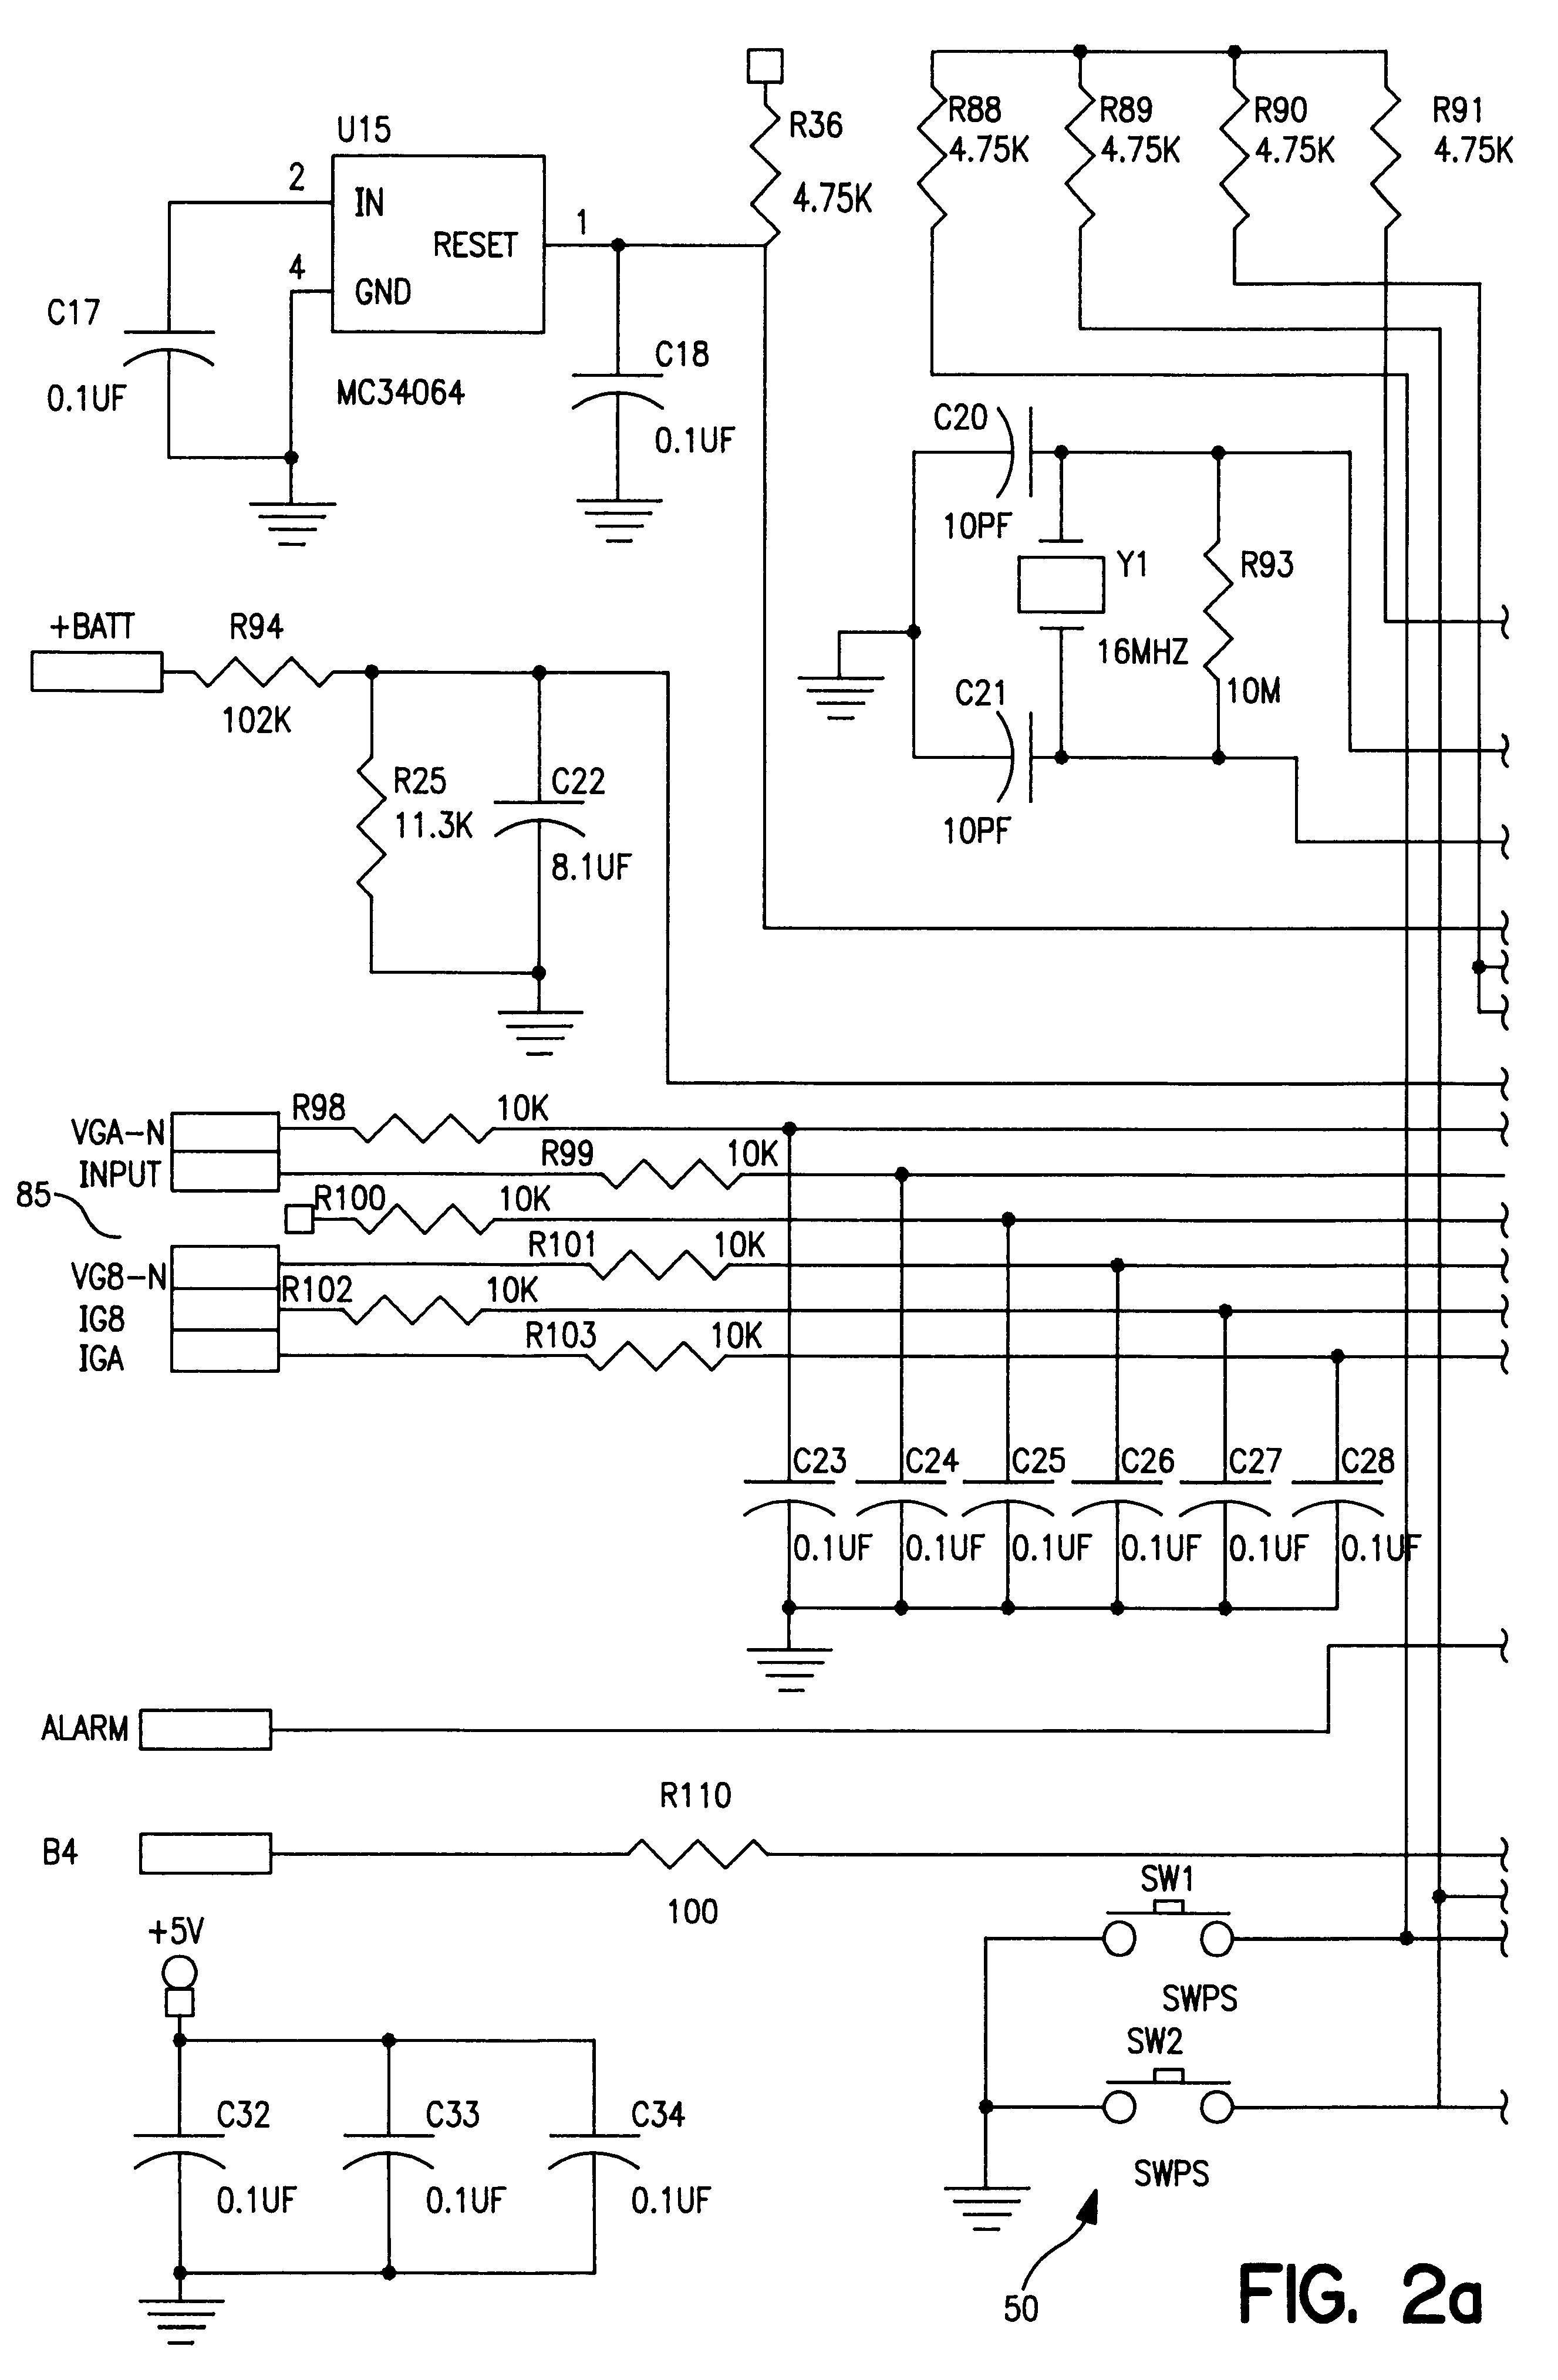 Transfer Switch Wiring Diagram Generac Transfer Switch Wiring Diagram Gif Throughout Generator Of Transfer Switch Wiring Diagram